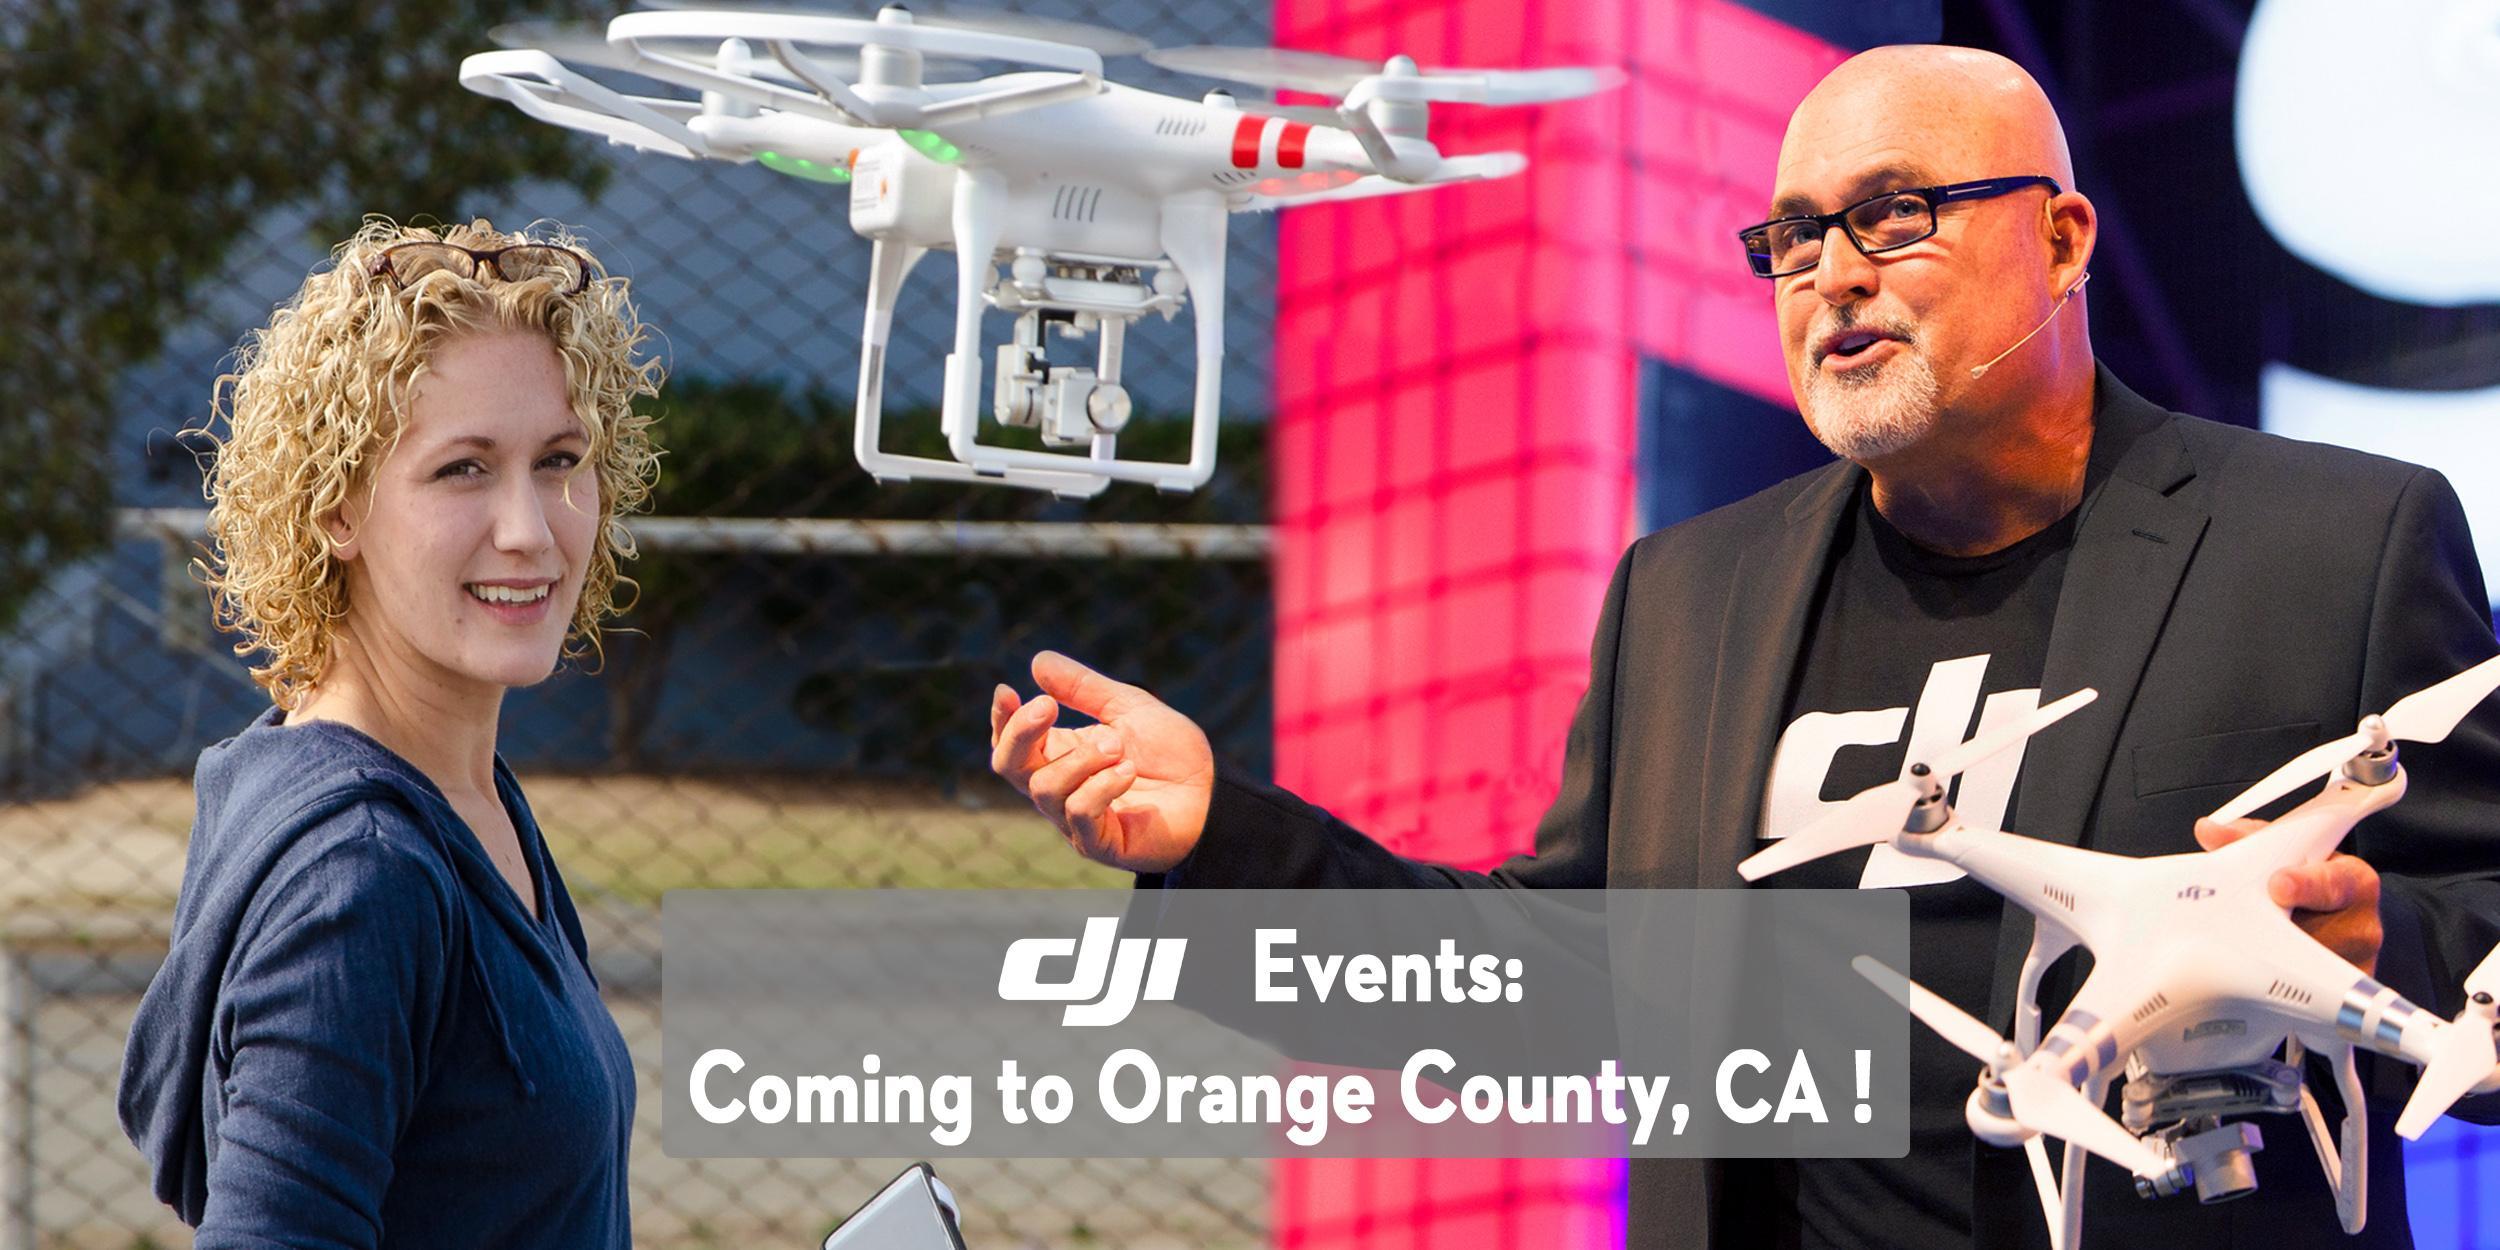 DJI Aerial Photo Academy – on Tour in Orange County, CA!